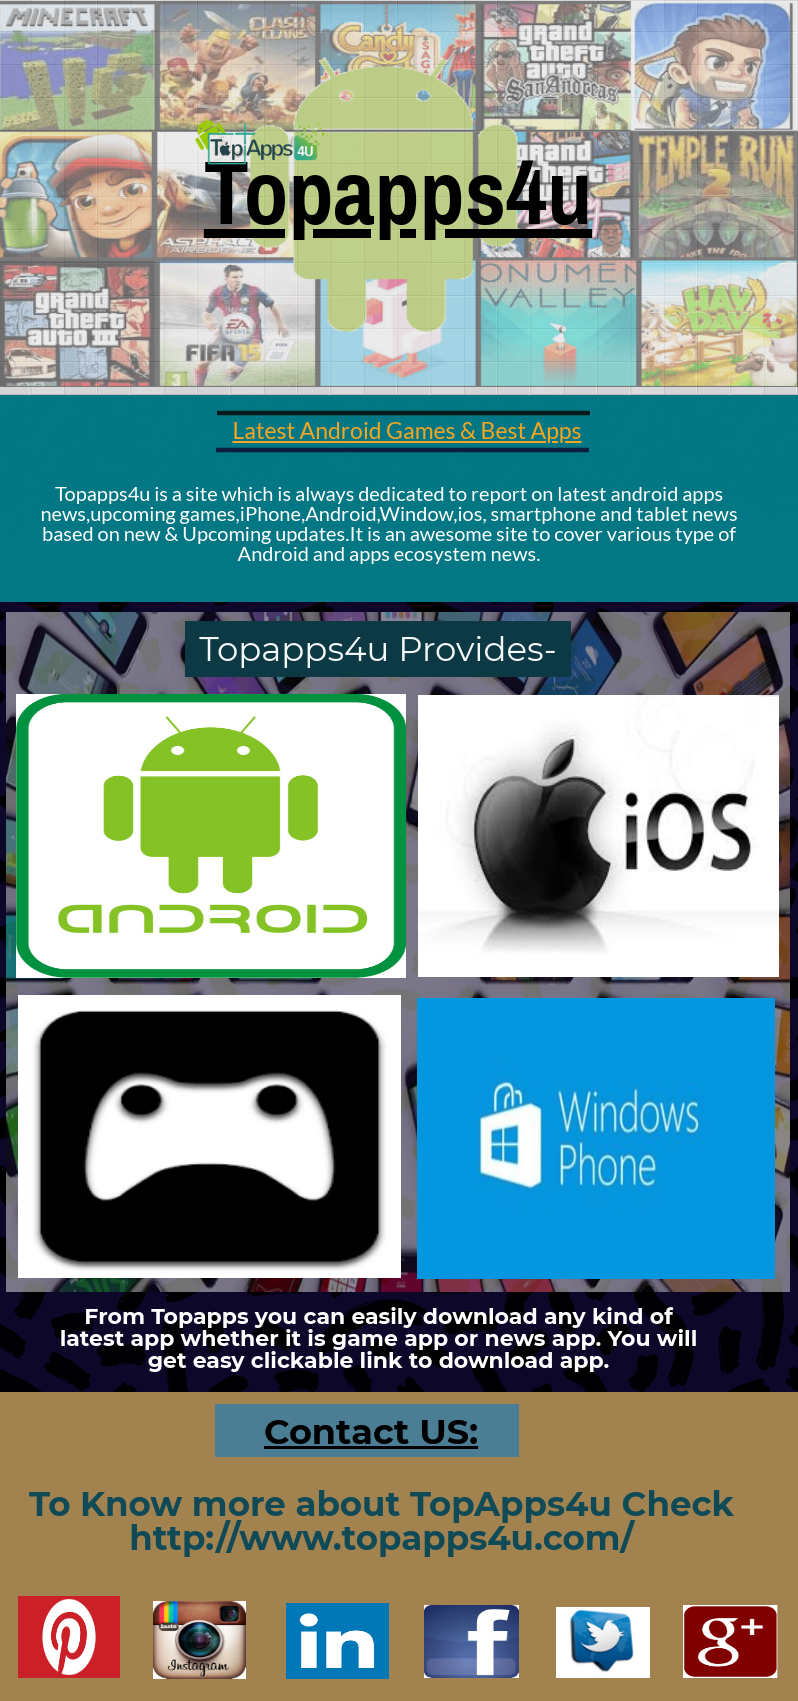 Top offline mmorpg android games 2018 | MMORPG | Mmorpg